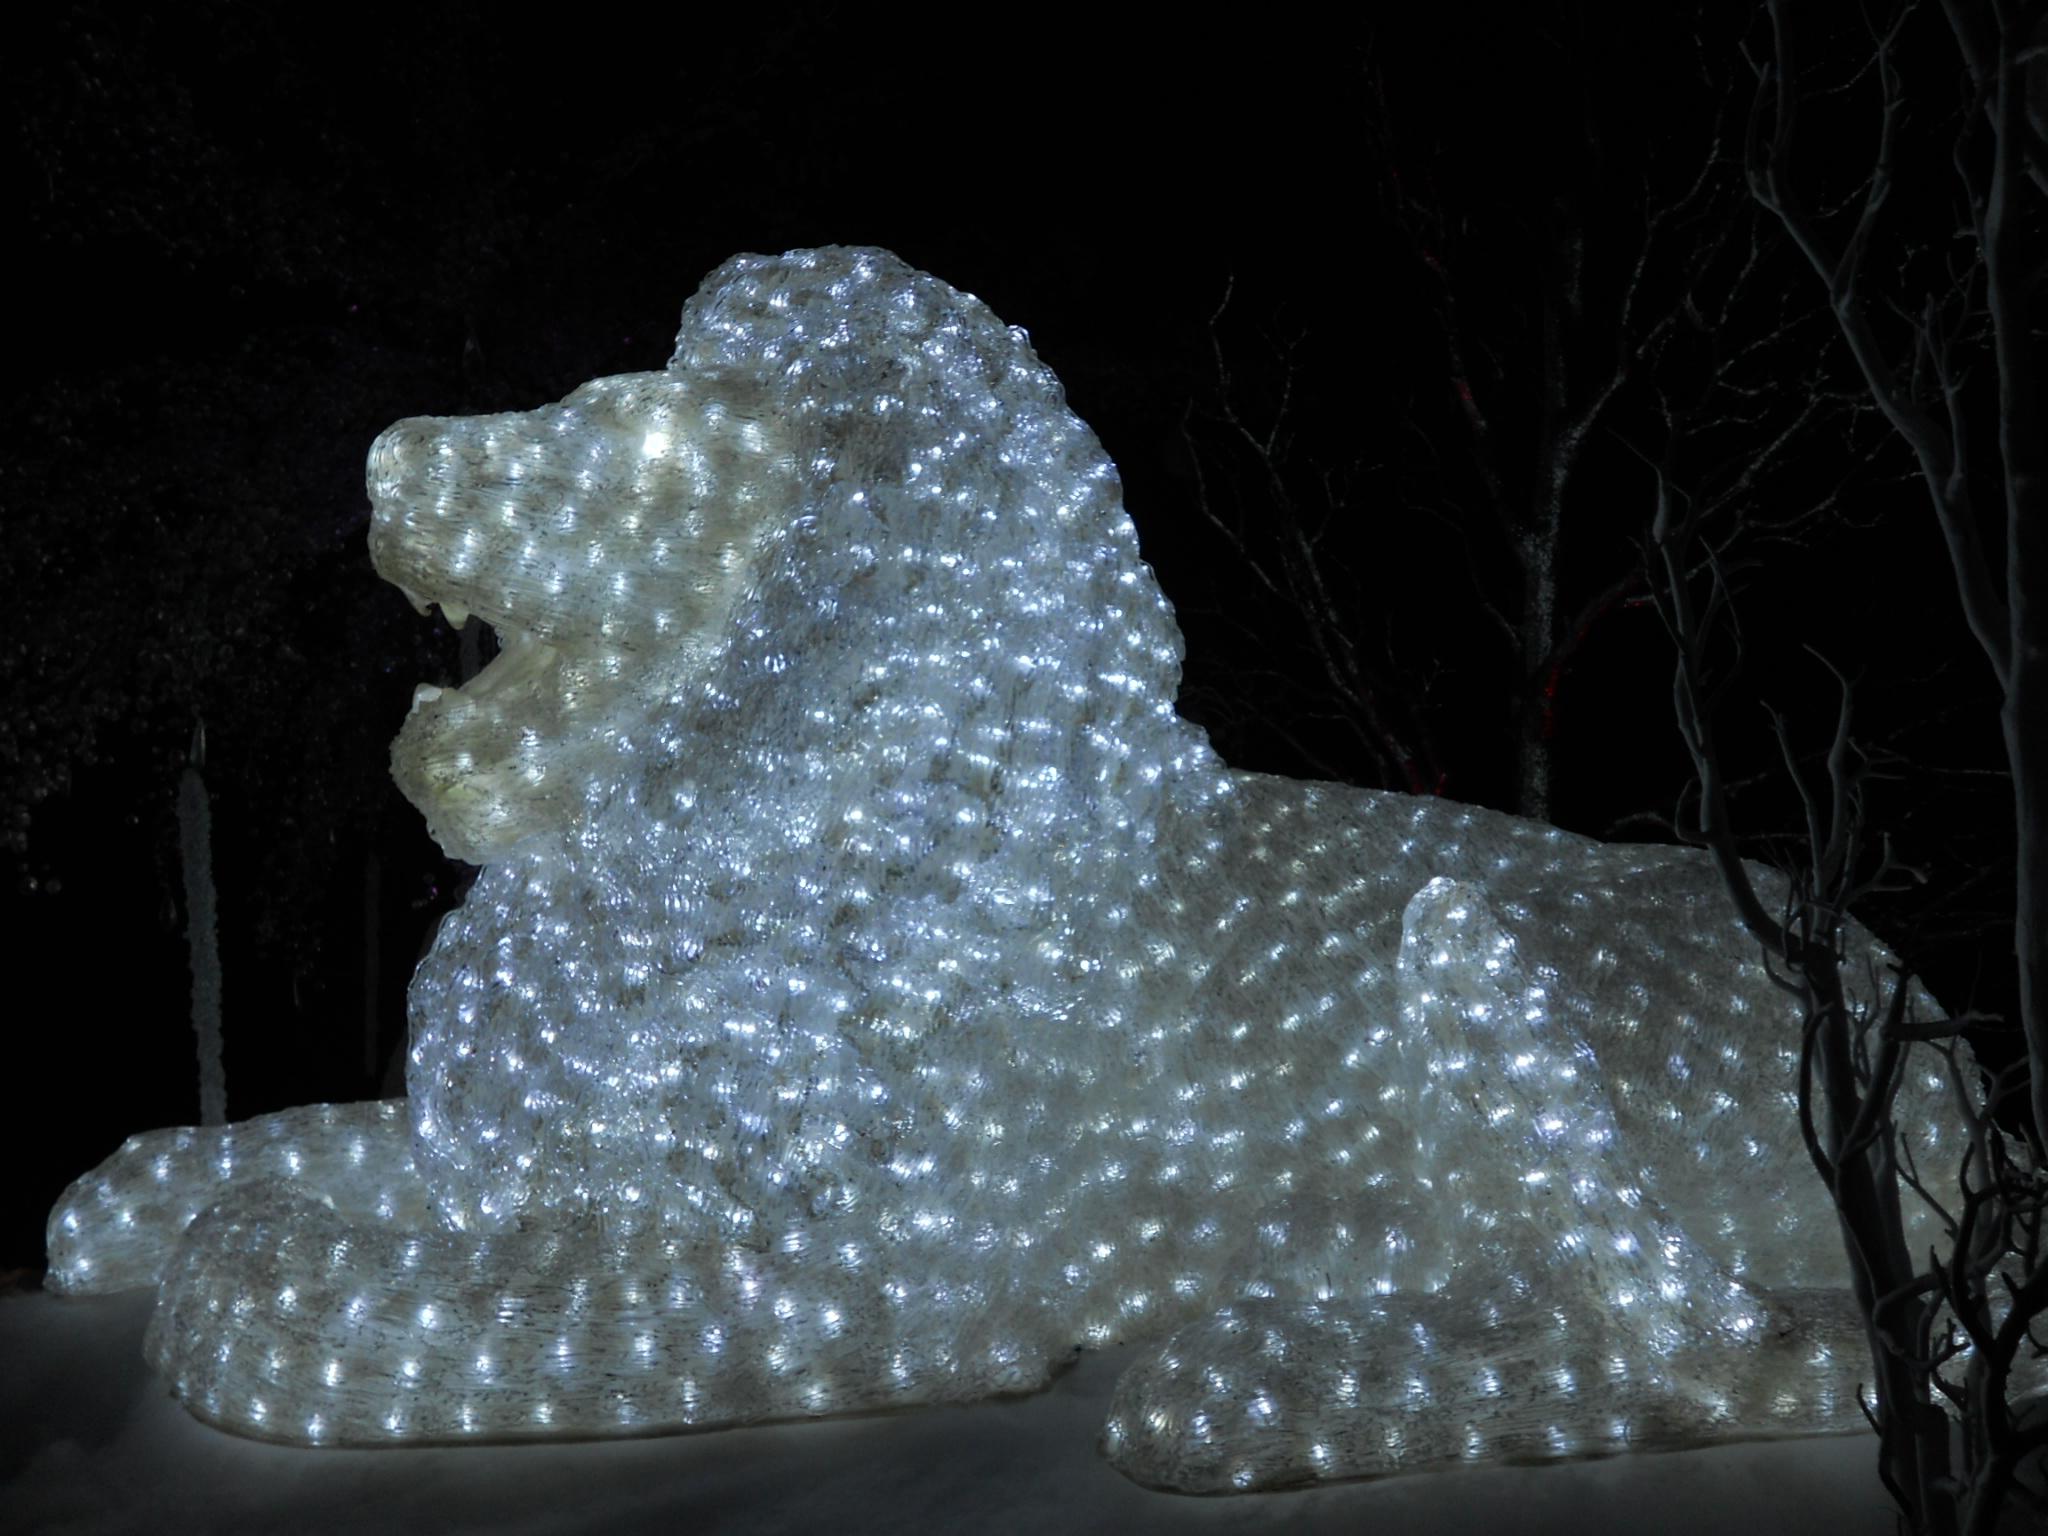 Lowry Park Zoo Christmas.File Christmas Lighting Lowry Park Zoo5 Jpg Wikimedia